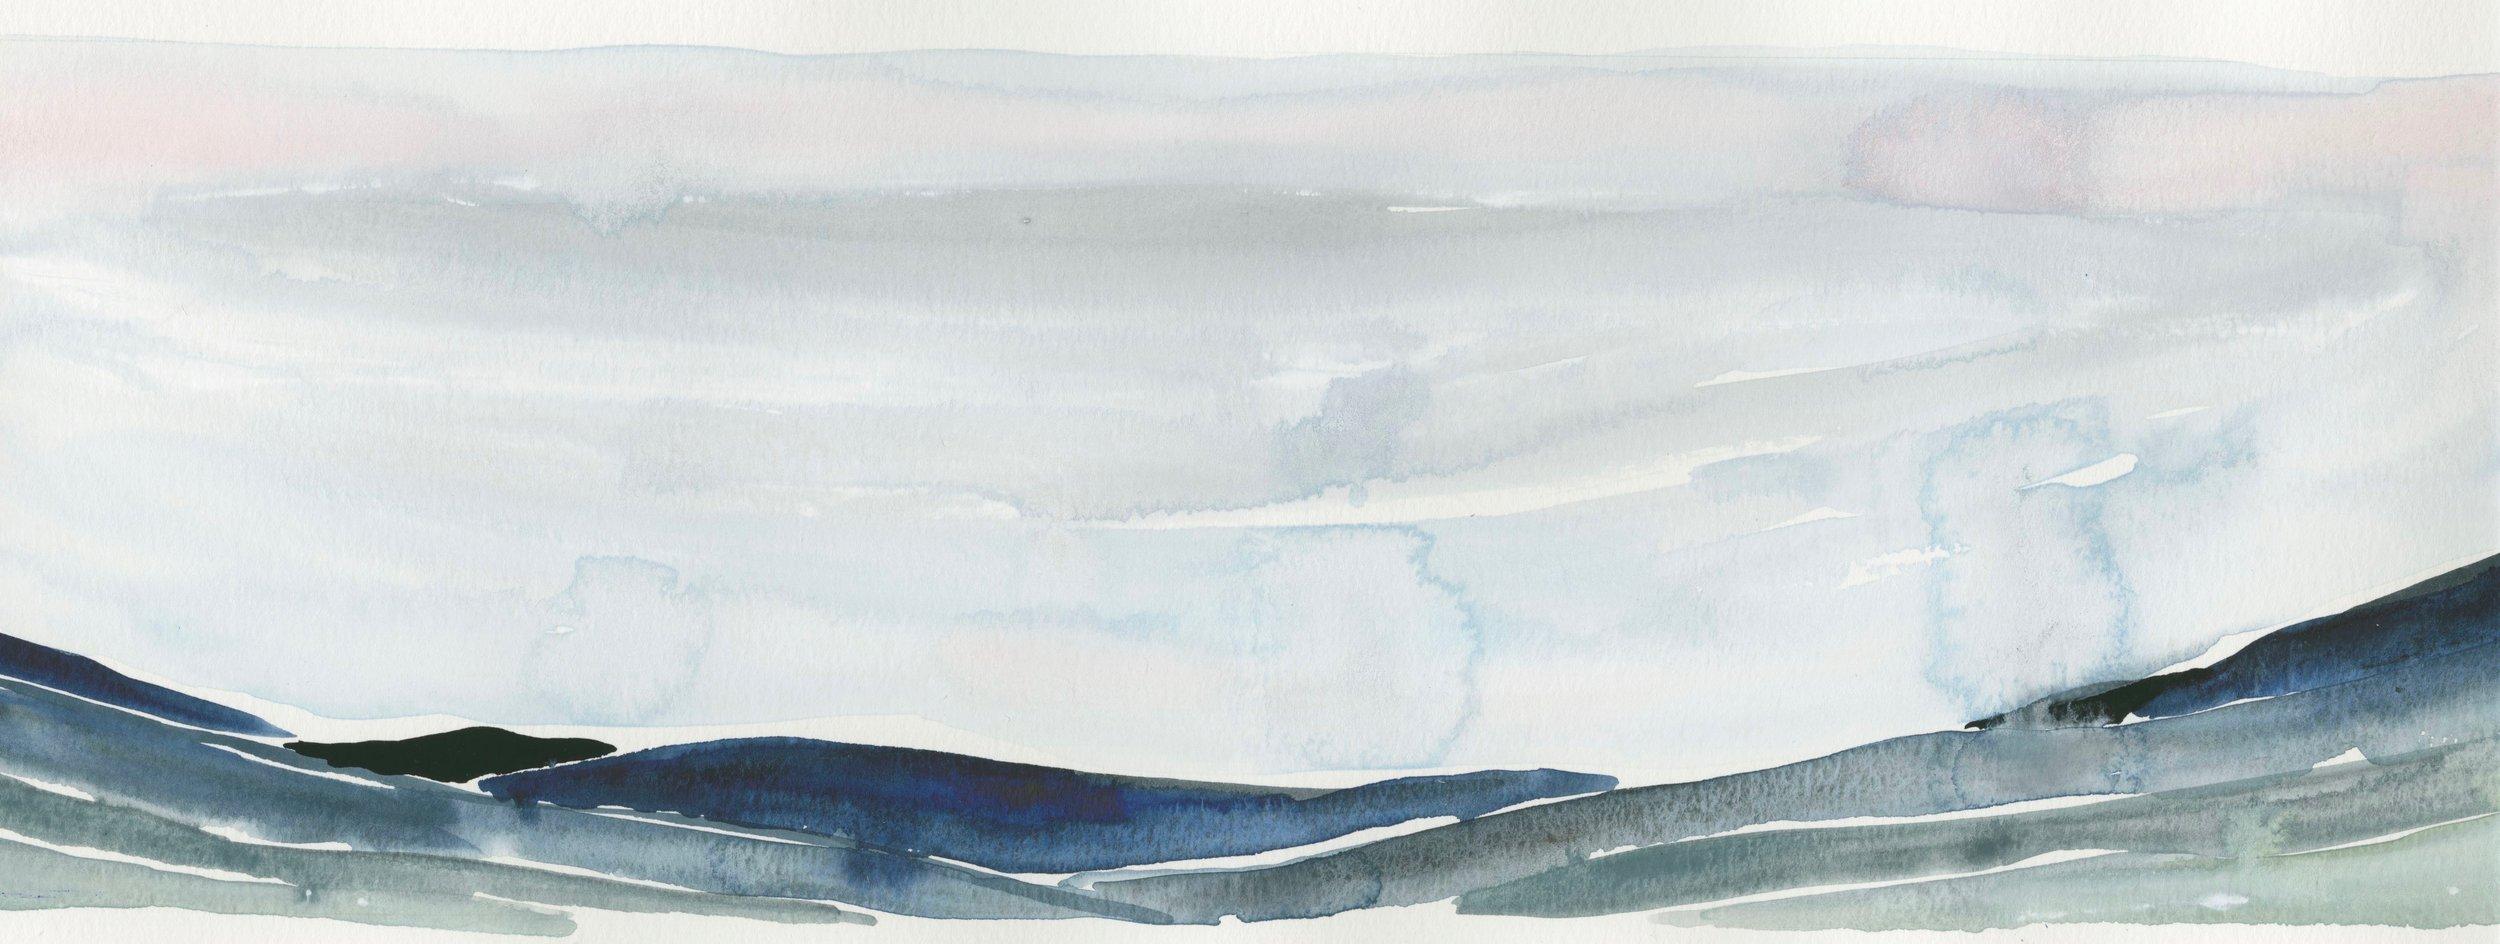 SEA LAND SKY 16